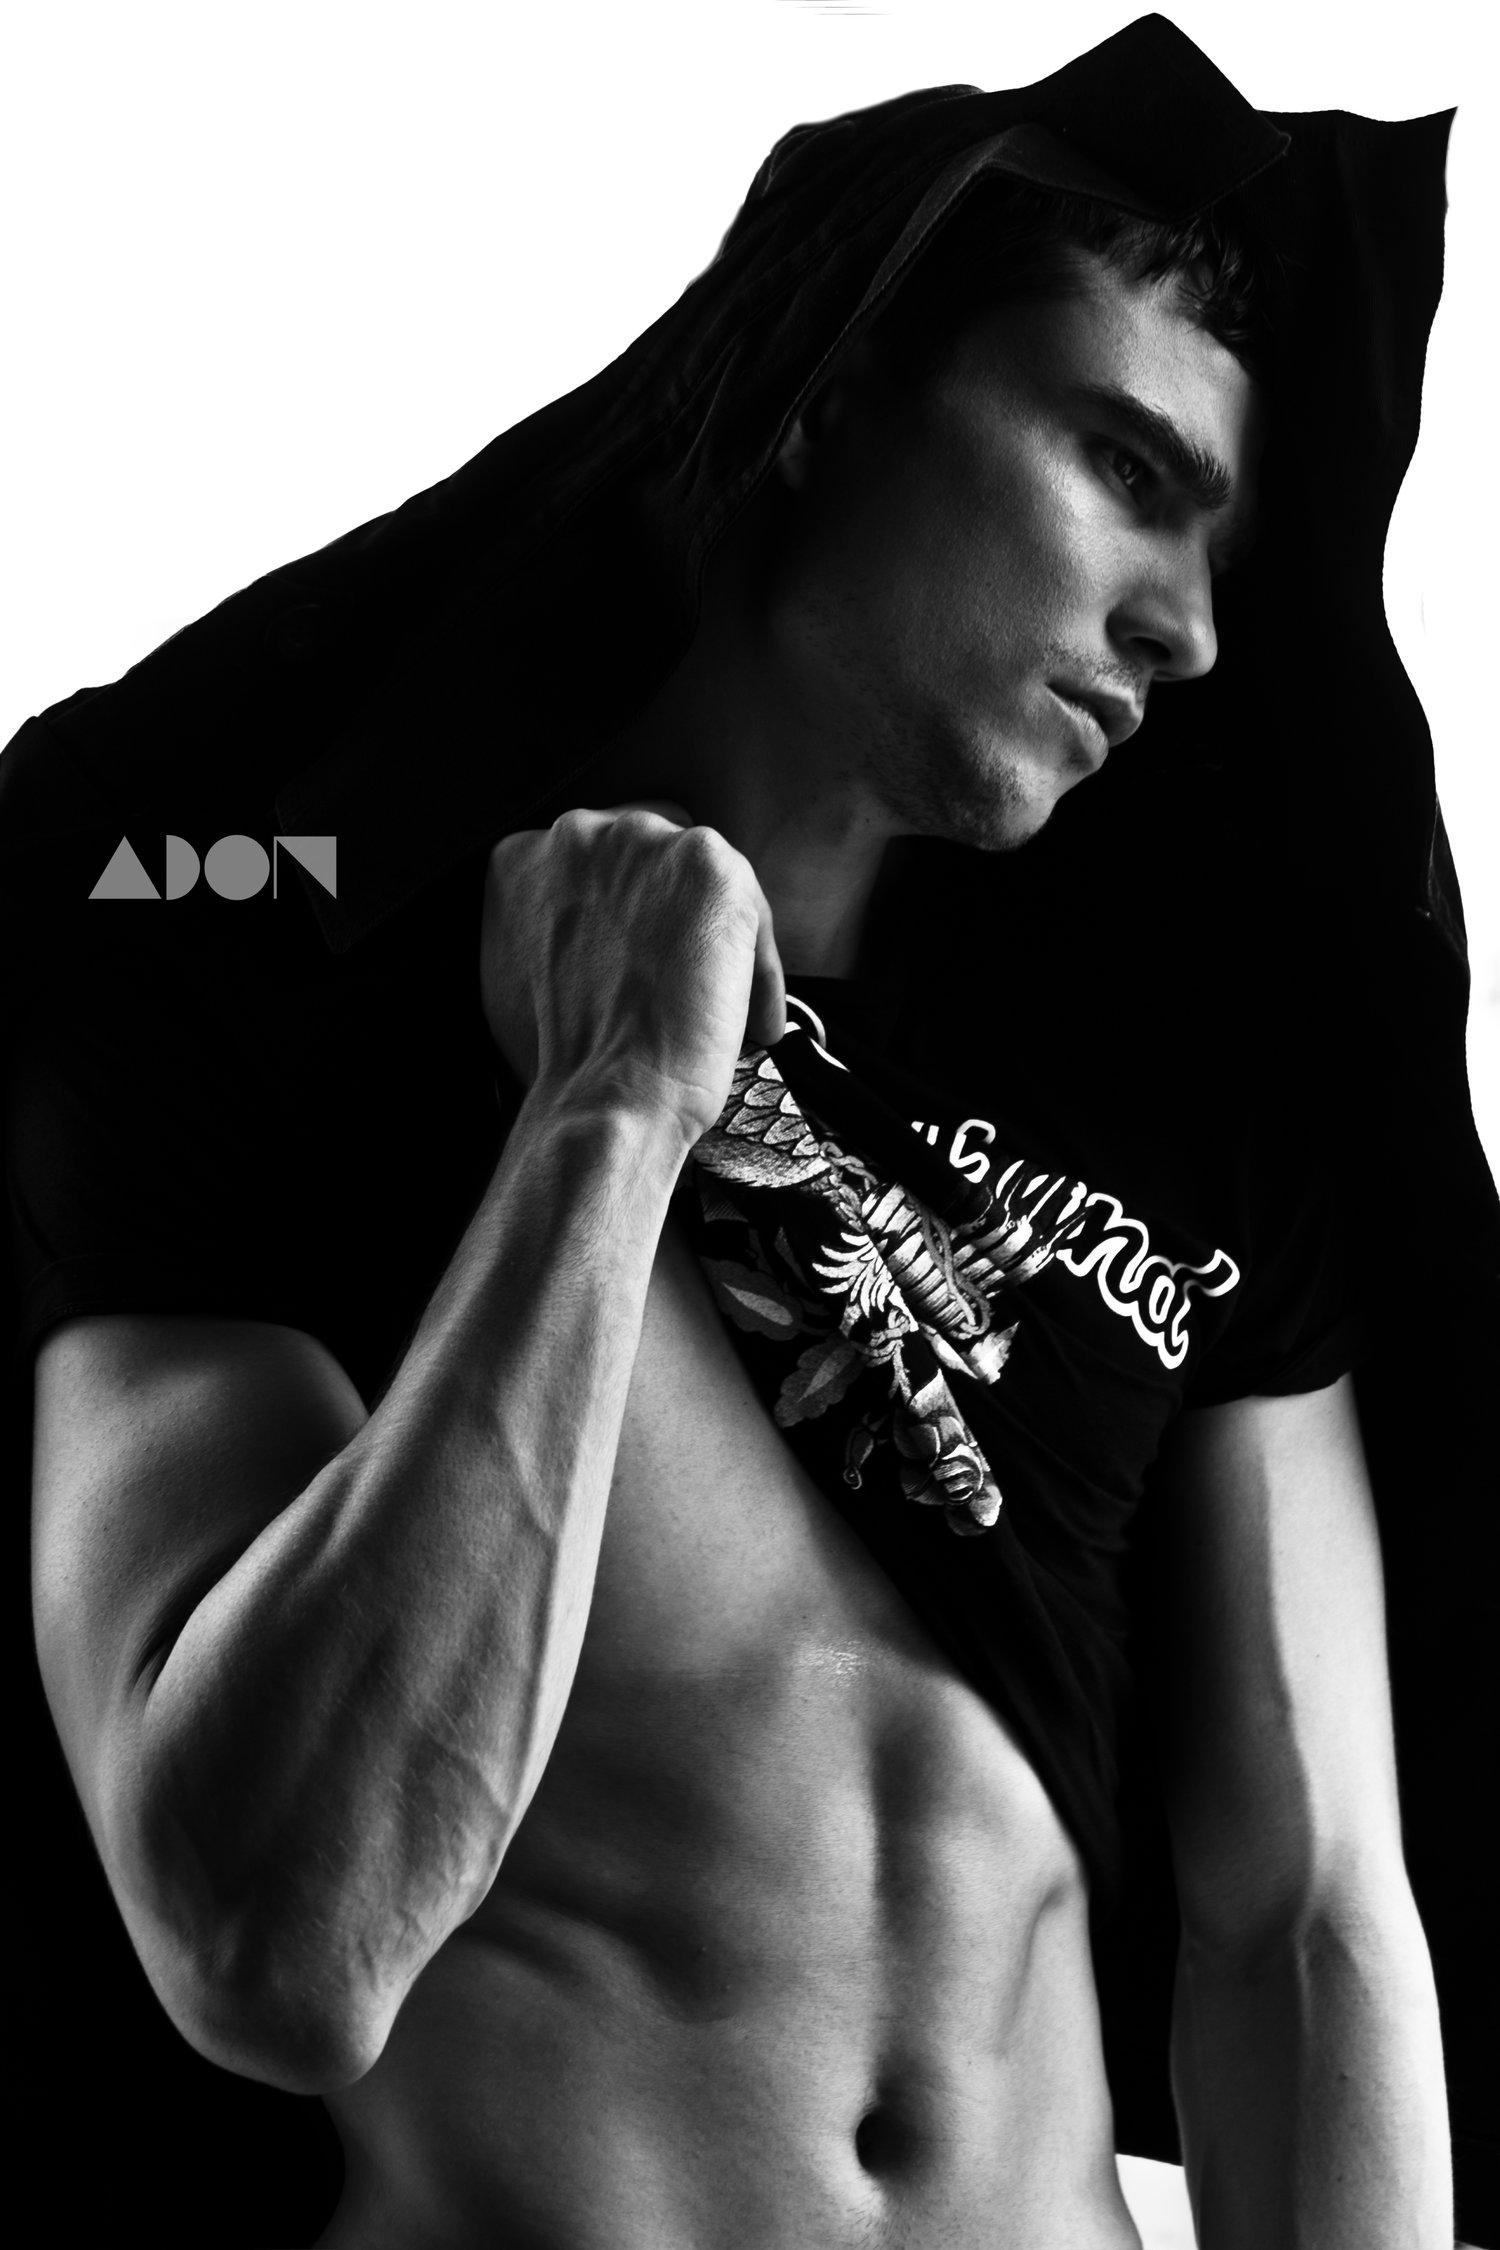 Adon Exclusive: Model Diego Biancatti By Xram Ragde